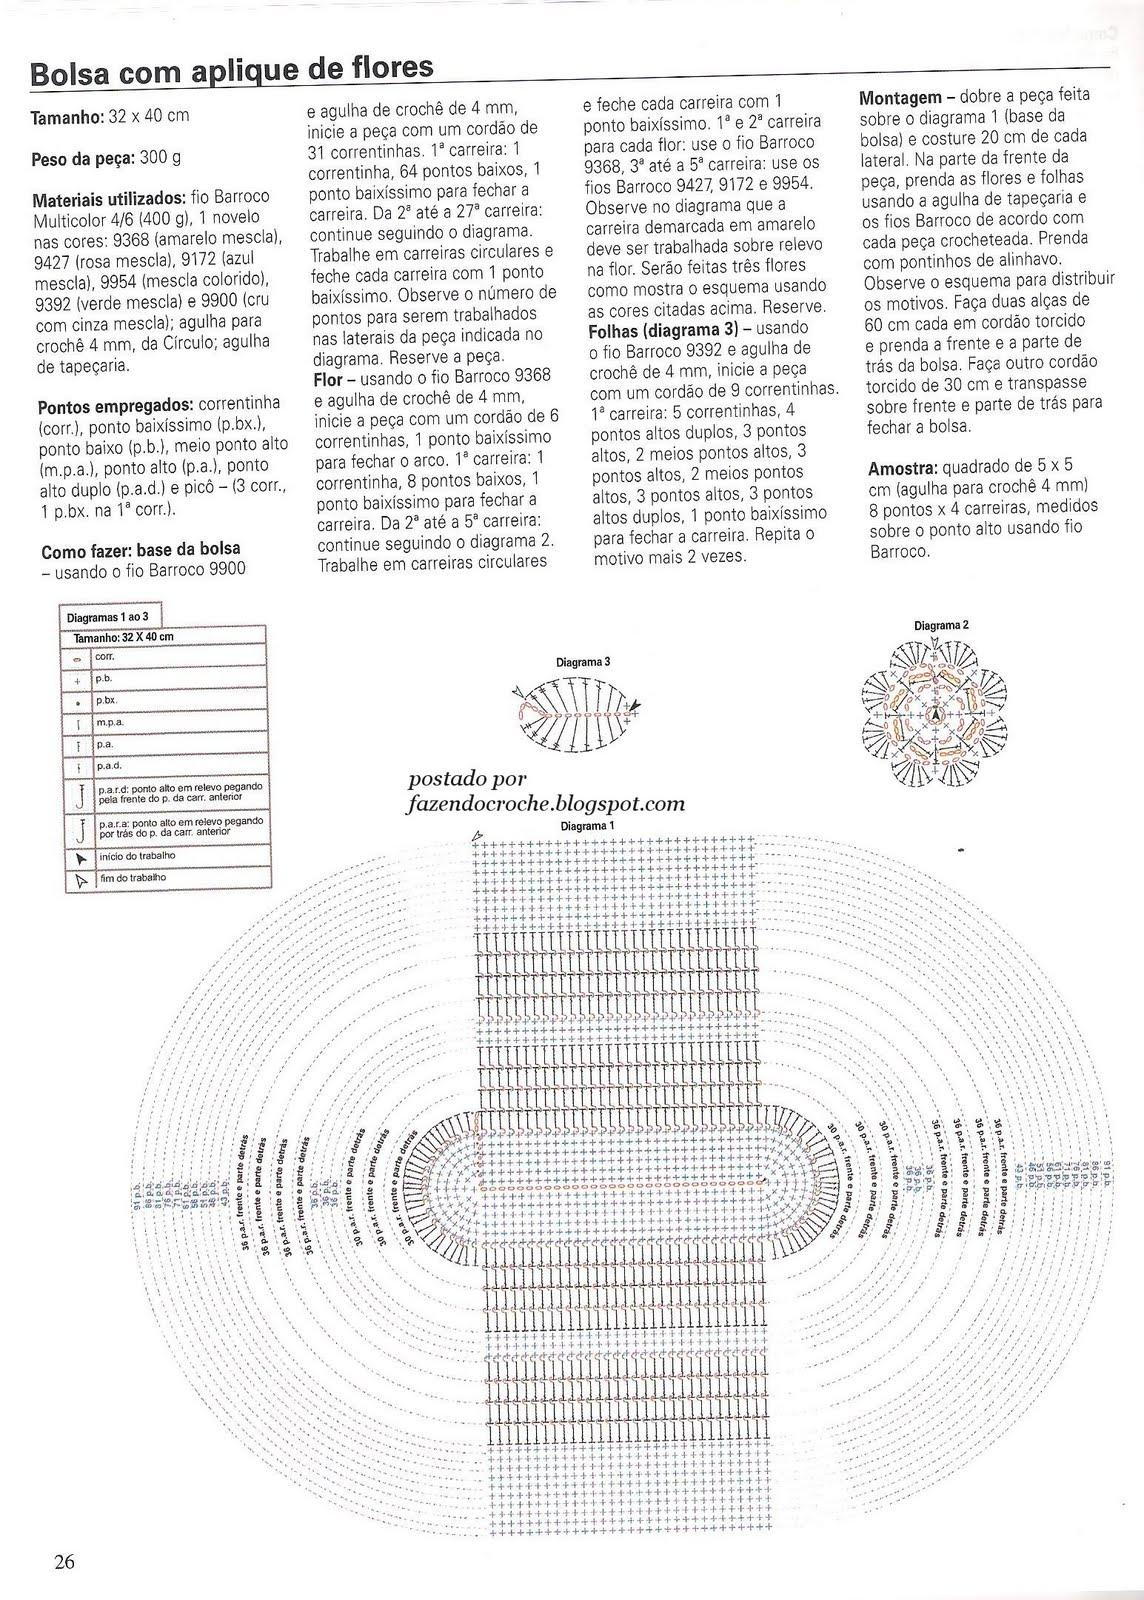 TEJER GANCHILLO CROCHET: BOLSOS O MOCHILAS CON FLORES A CROCHET ...